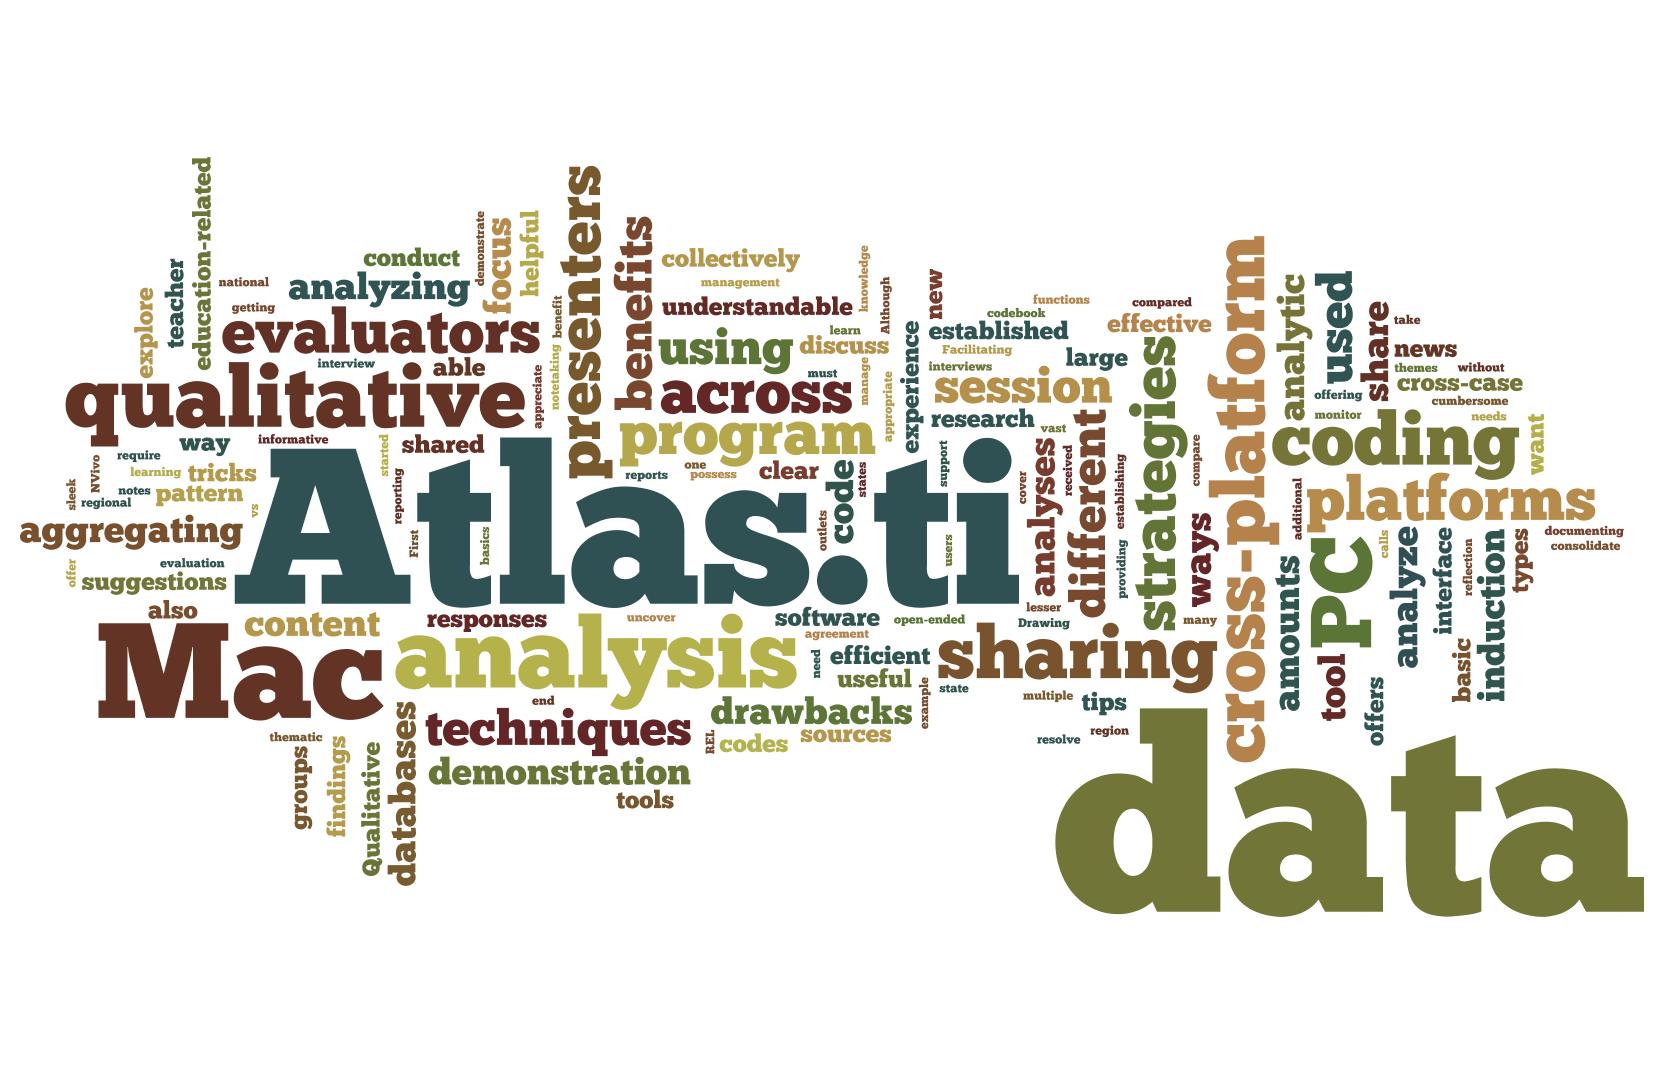 Atlas.ti Word cloud